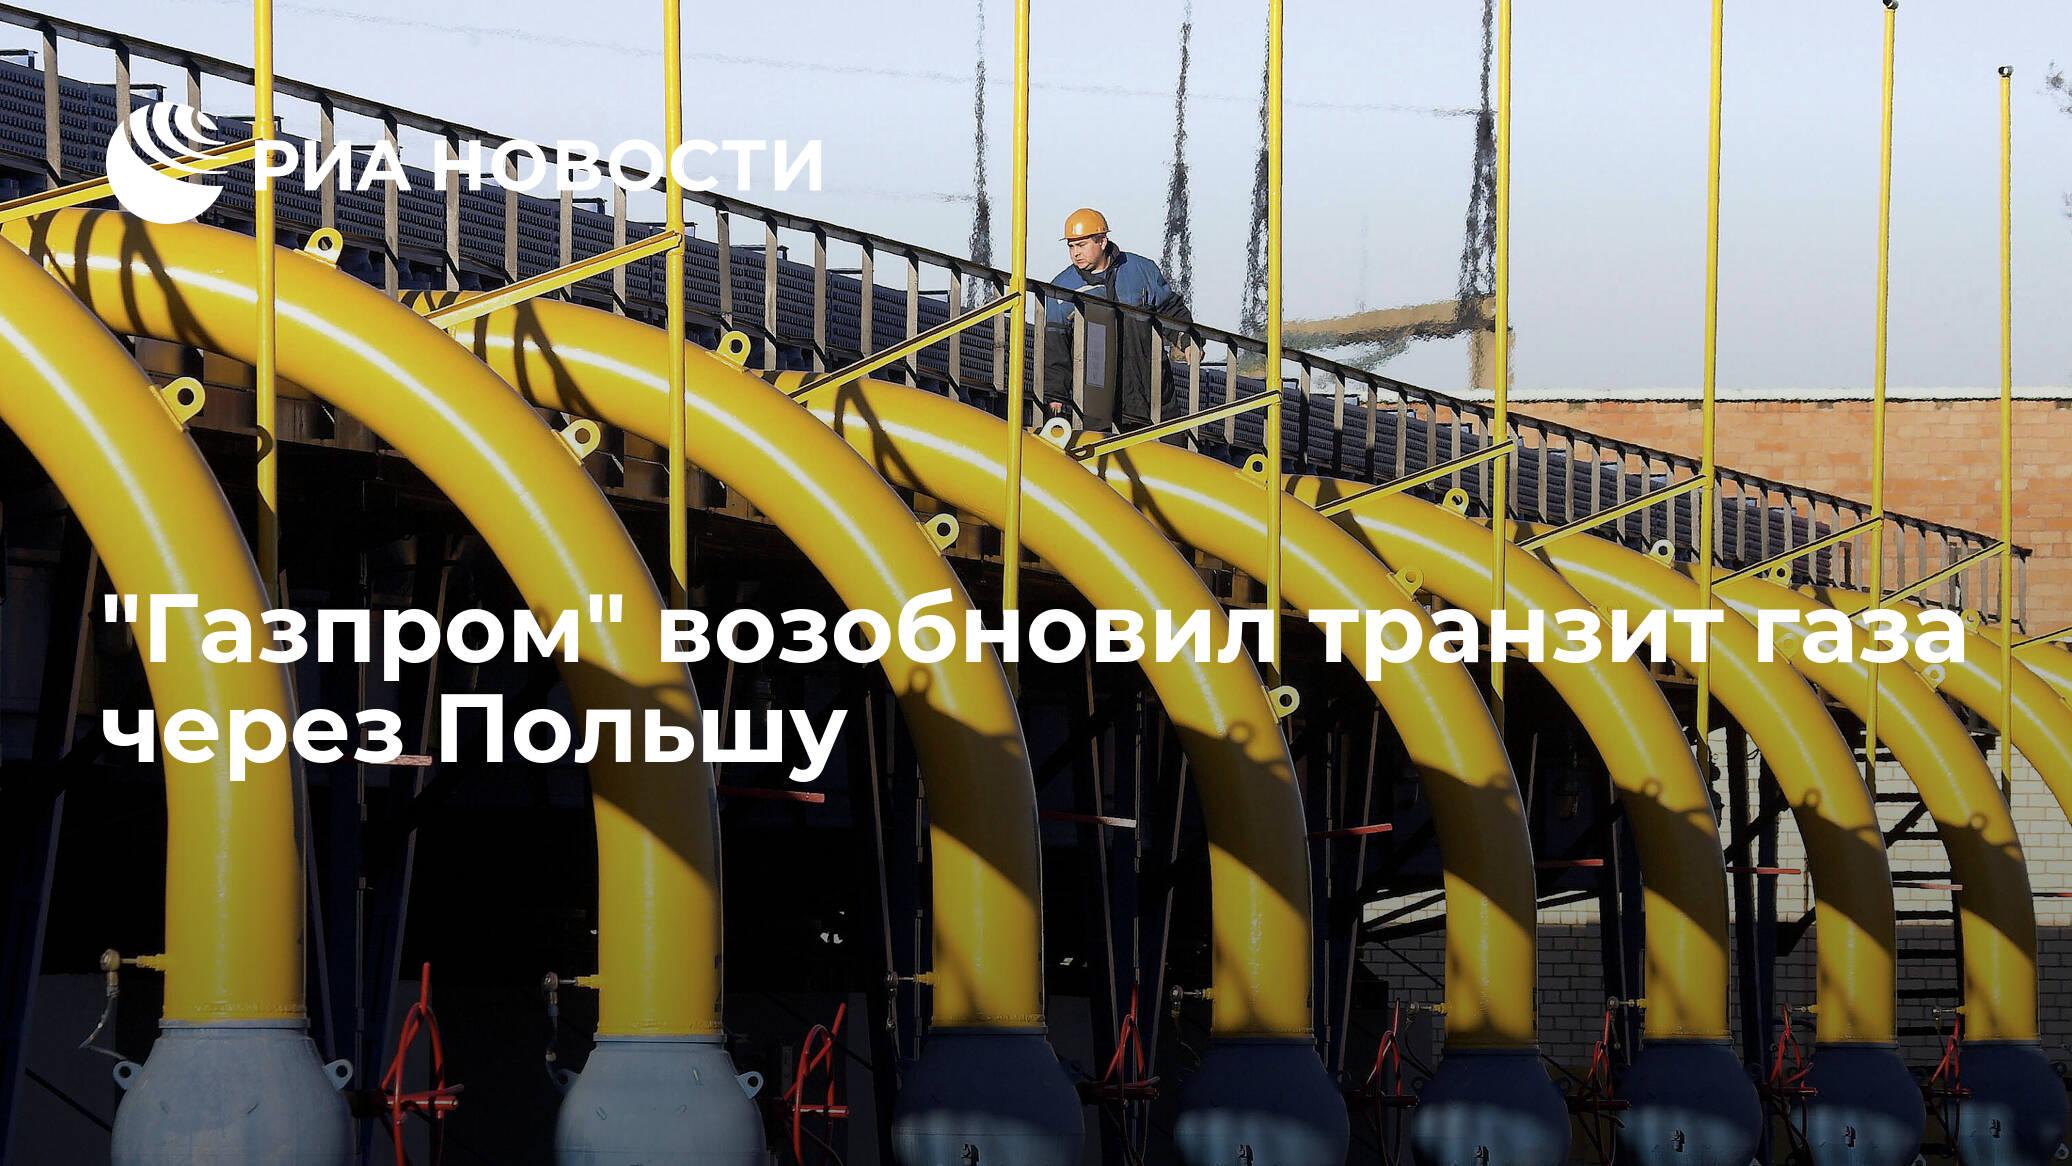 'Газпром' возобновил транзит газа через Польшу - РИА НОВОСТИ